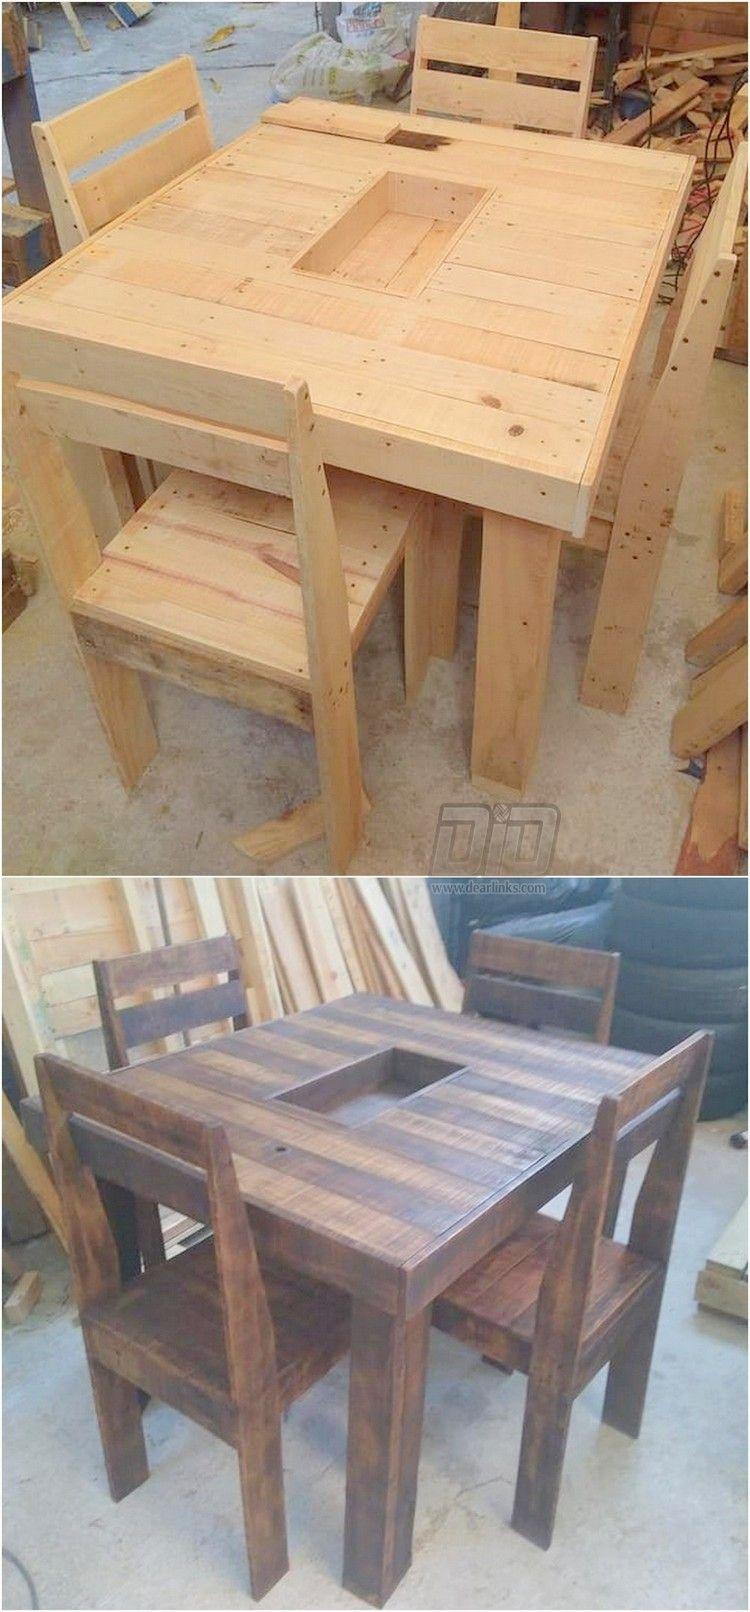 Idealistic Pallet Wood Creative Projects Com Imagens Moveis De